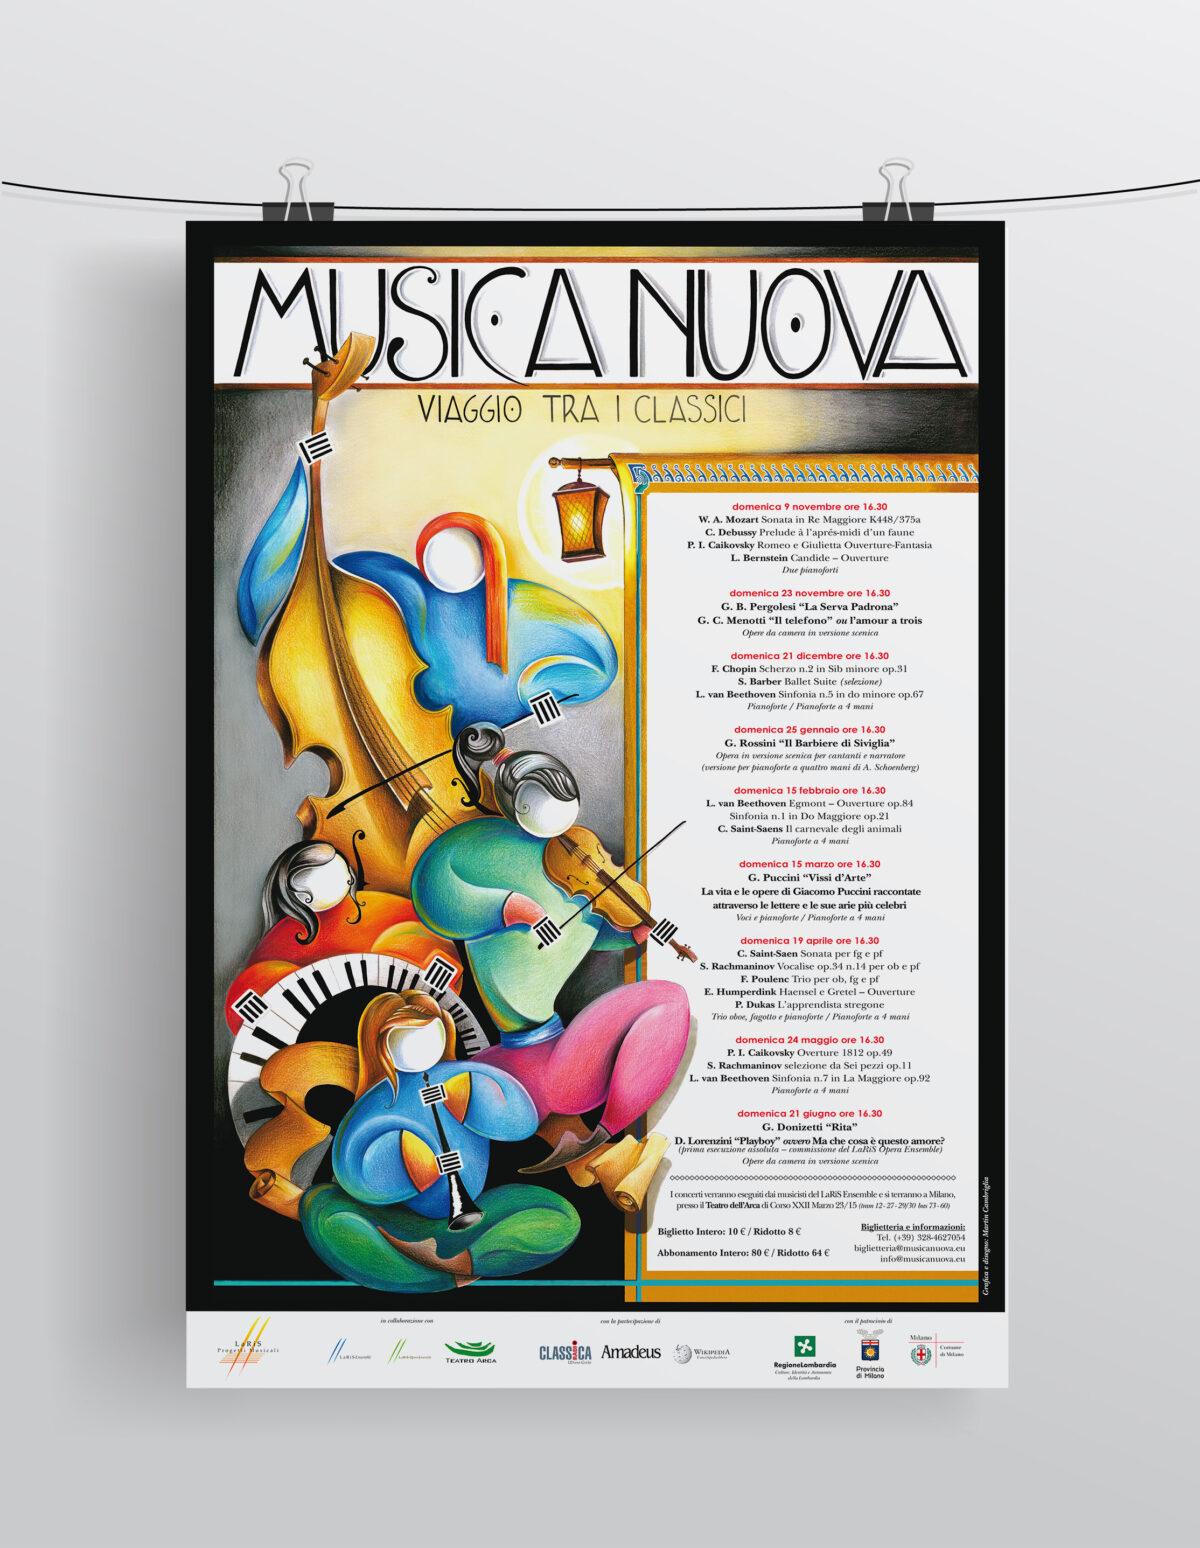 Musica Nuova - Locandina 2008